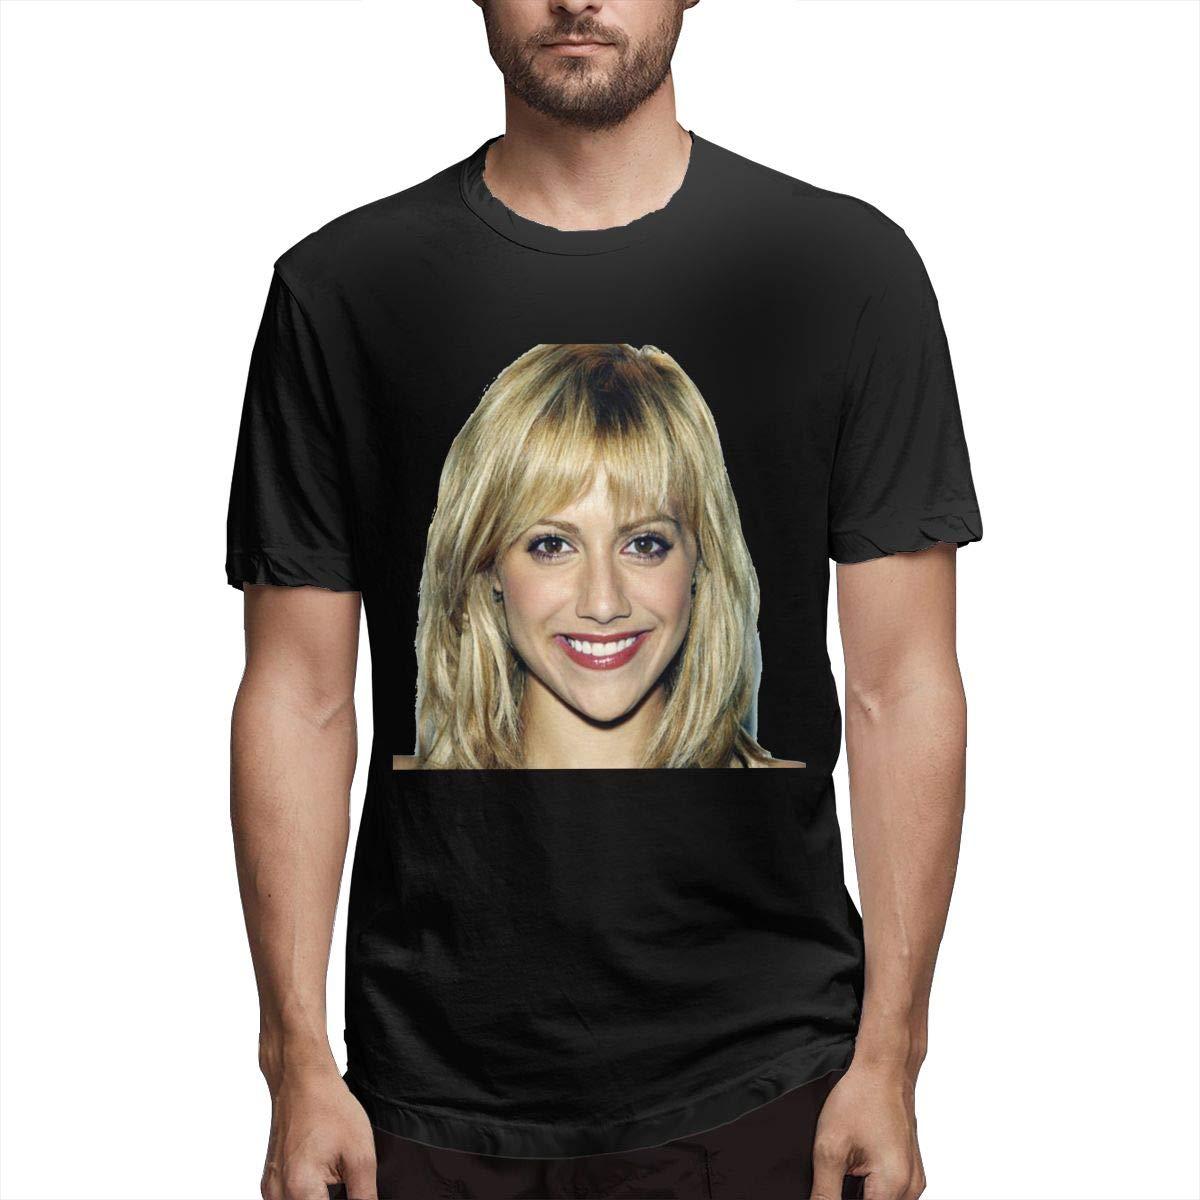 S Brittanymurphylogos Short Sleeve Classic Comfort Soft Crewneck Tshirt